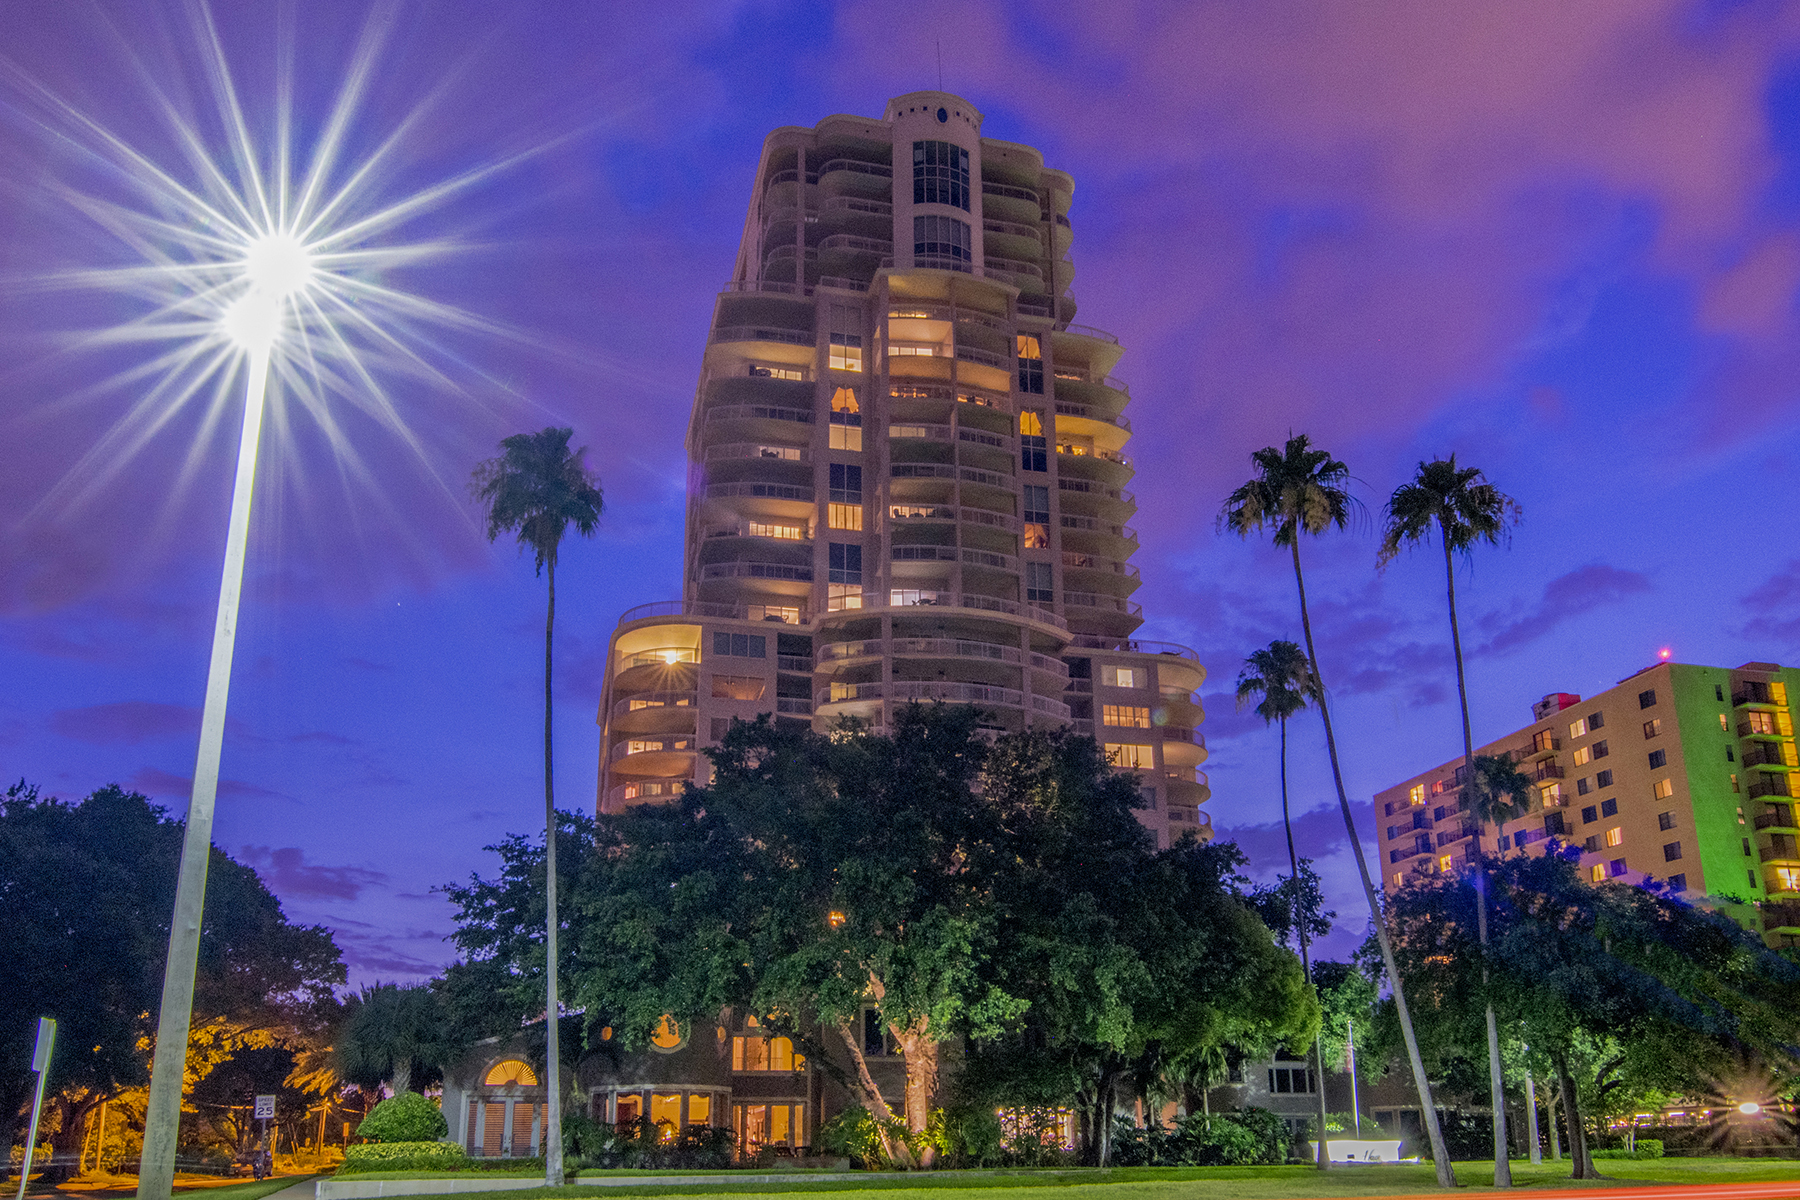 Condominium for Sale at SOUTH TAMPA 3507 Bayshore Blvd 601 Tampa, Florida, 33629 United States